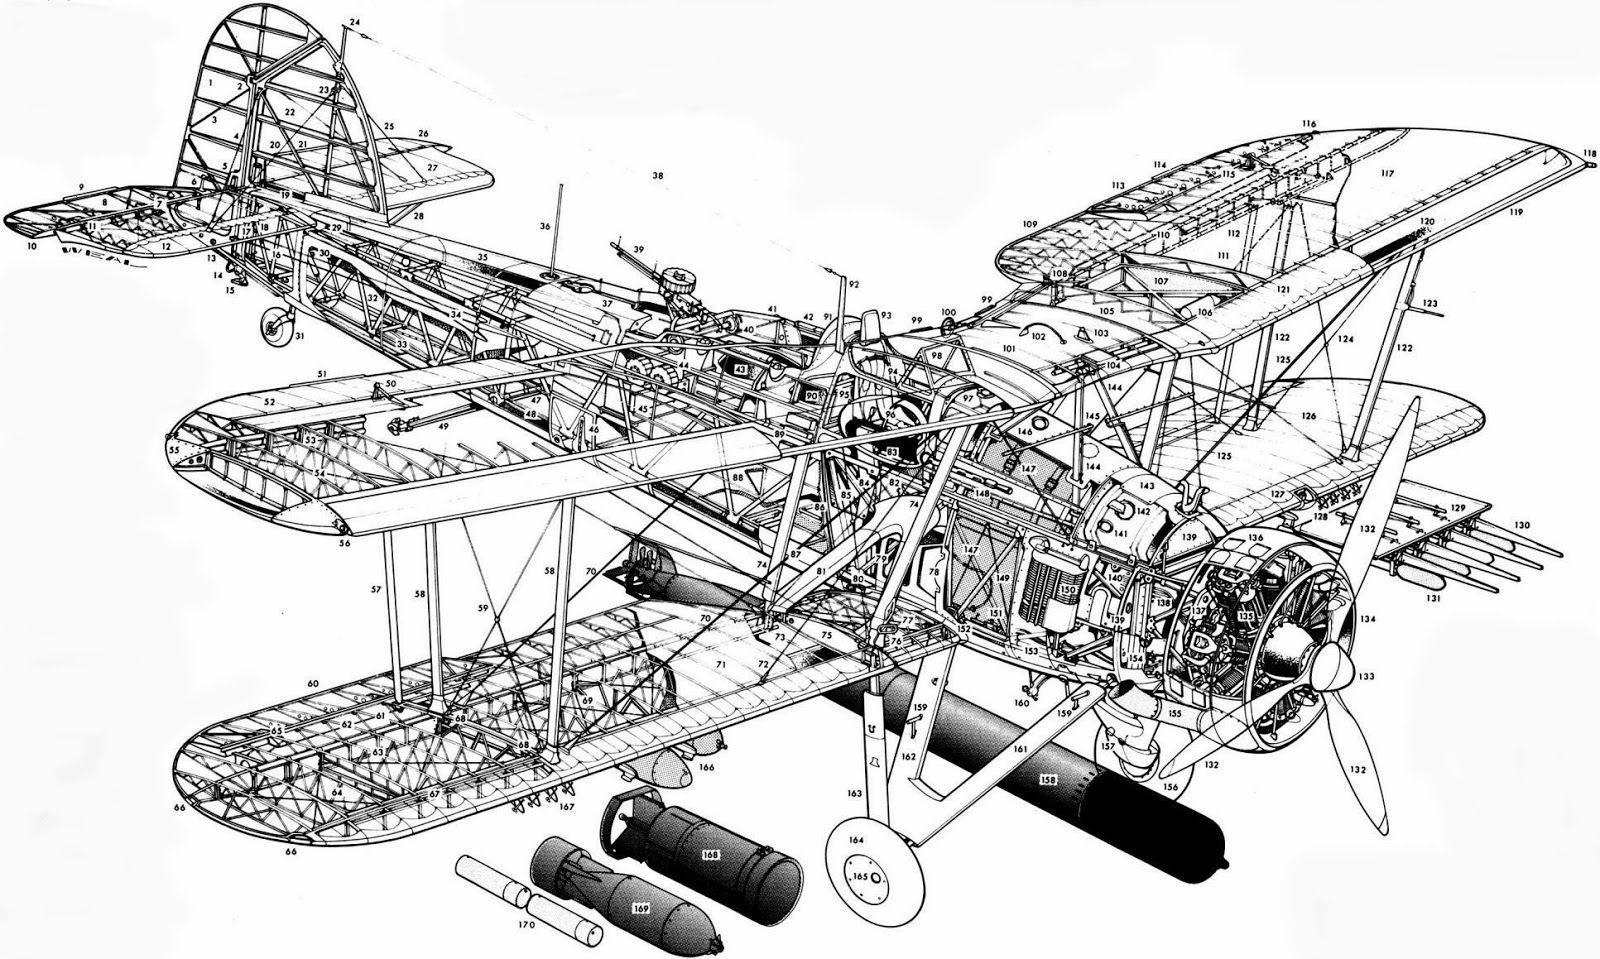 Fairey Swordfish Cutaway